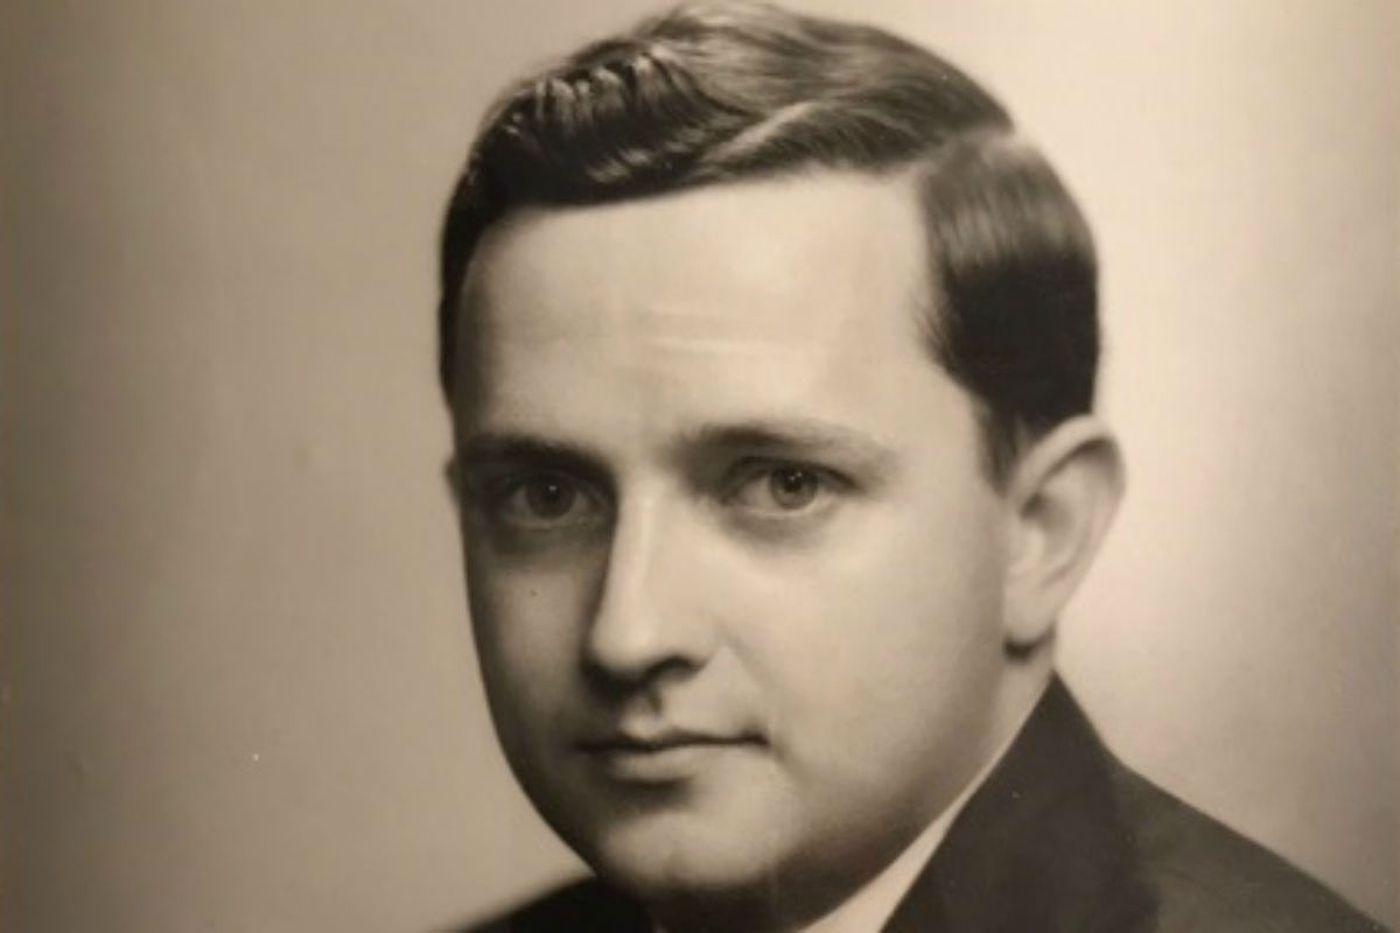 Thomas N. O'Neill Jr., 89, respected senior judge, great friend, and lively storyteller